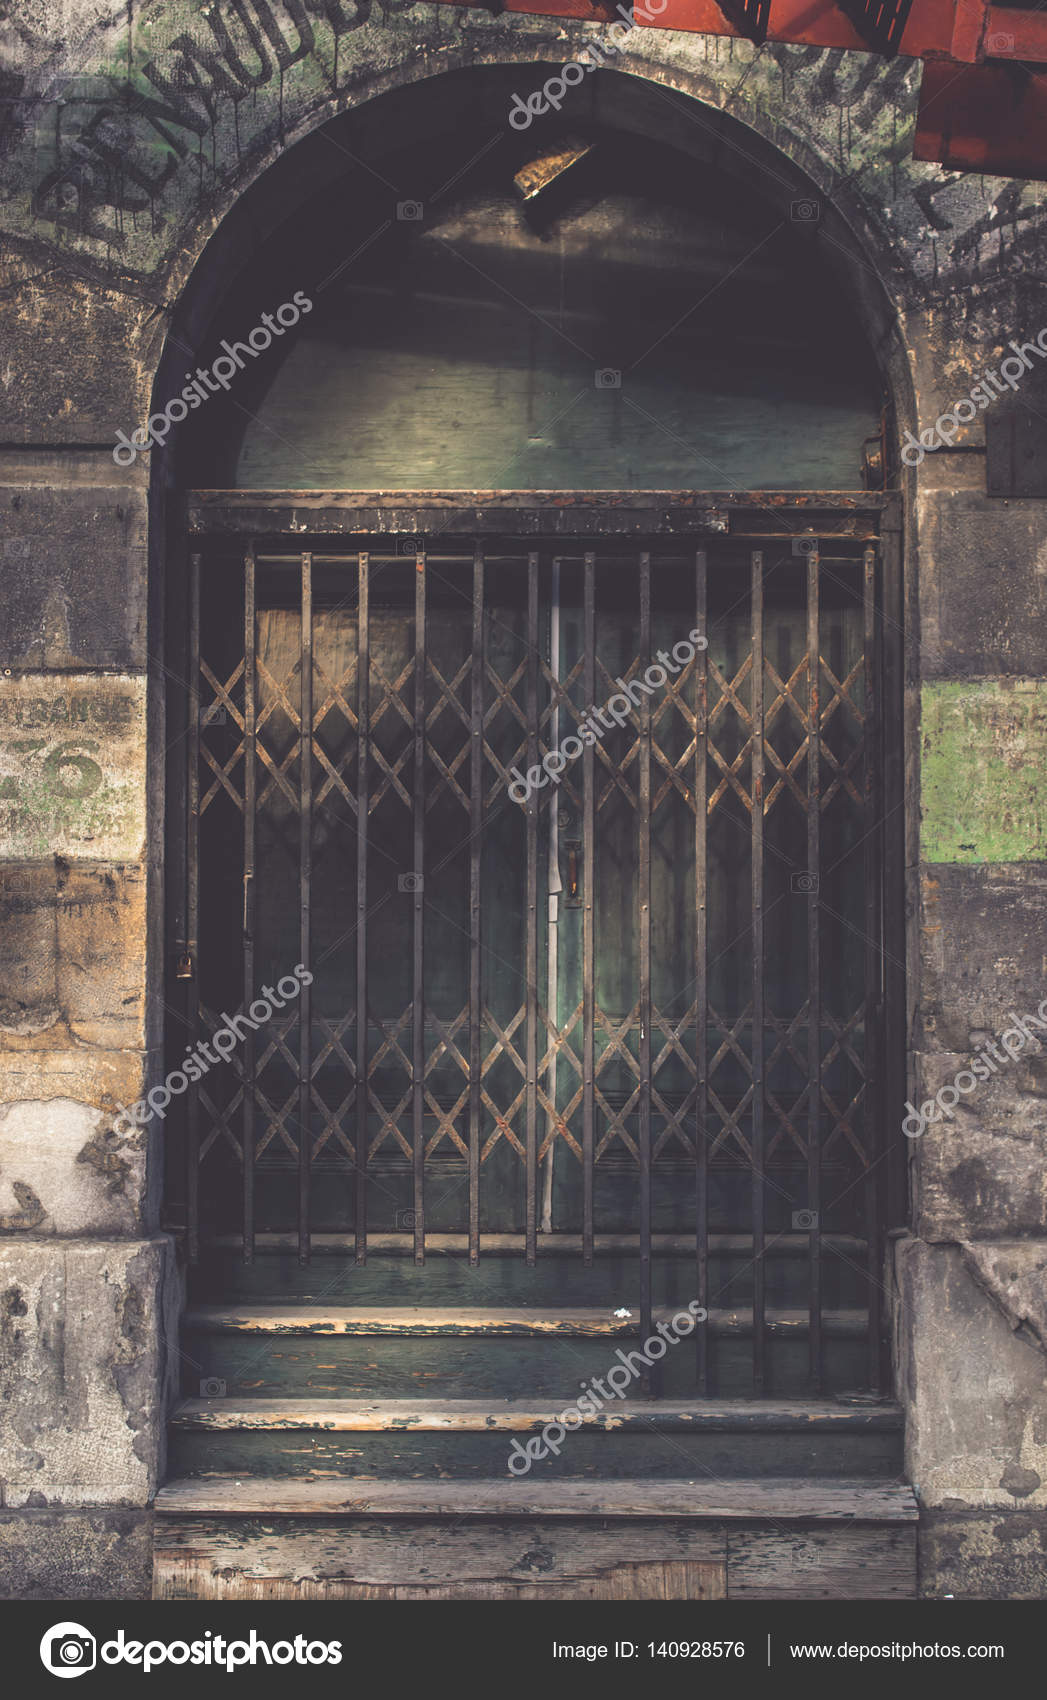 Vintage sliding barred door in the dark tone for interior or ex u2014 Stock Photo & vintage sliding barred door in the dark tone for interior or ex ...